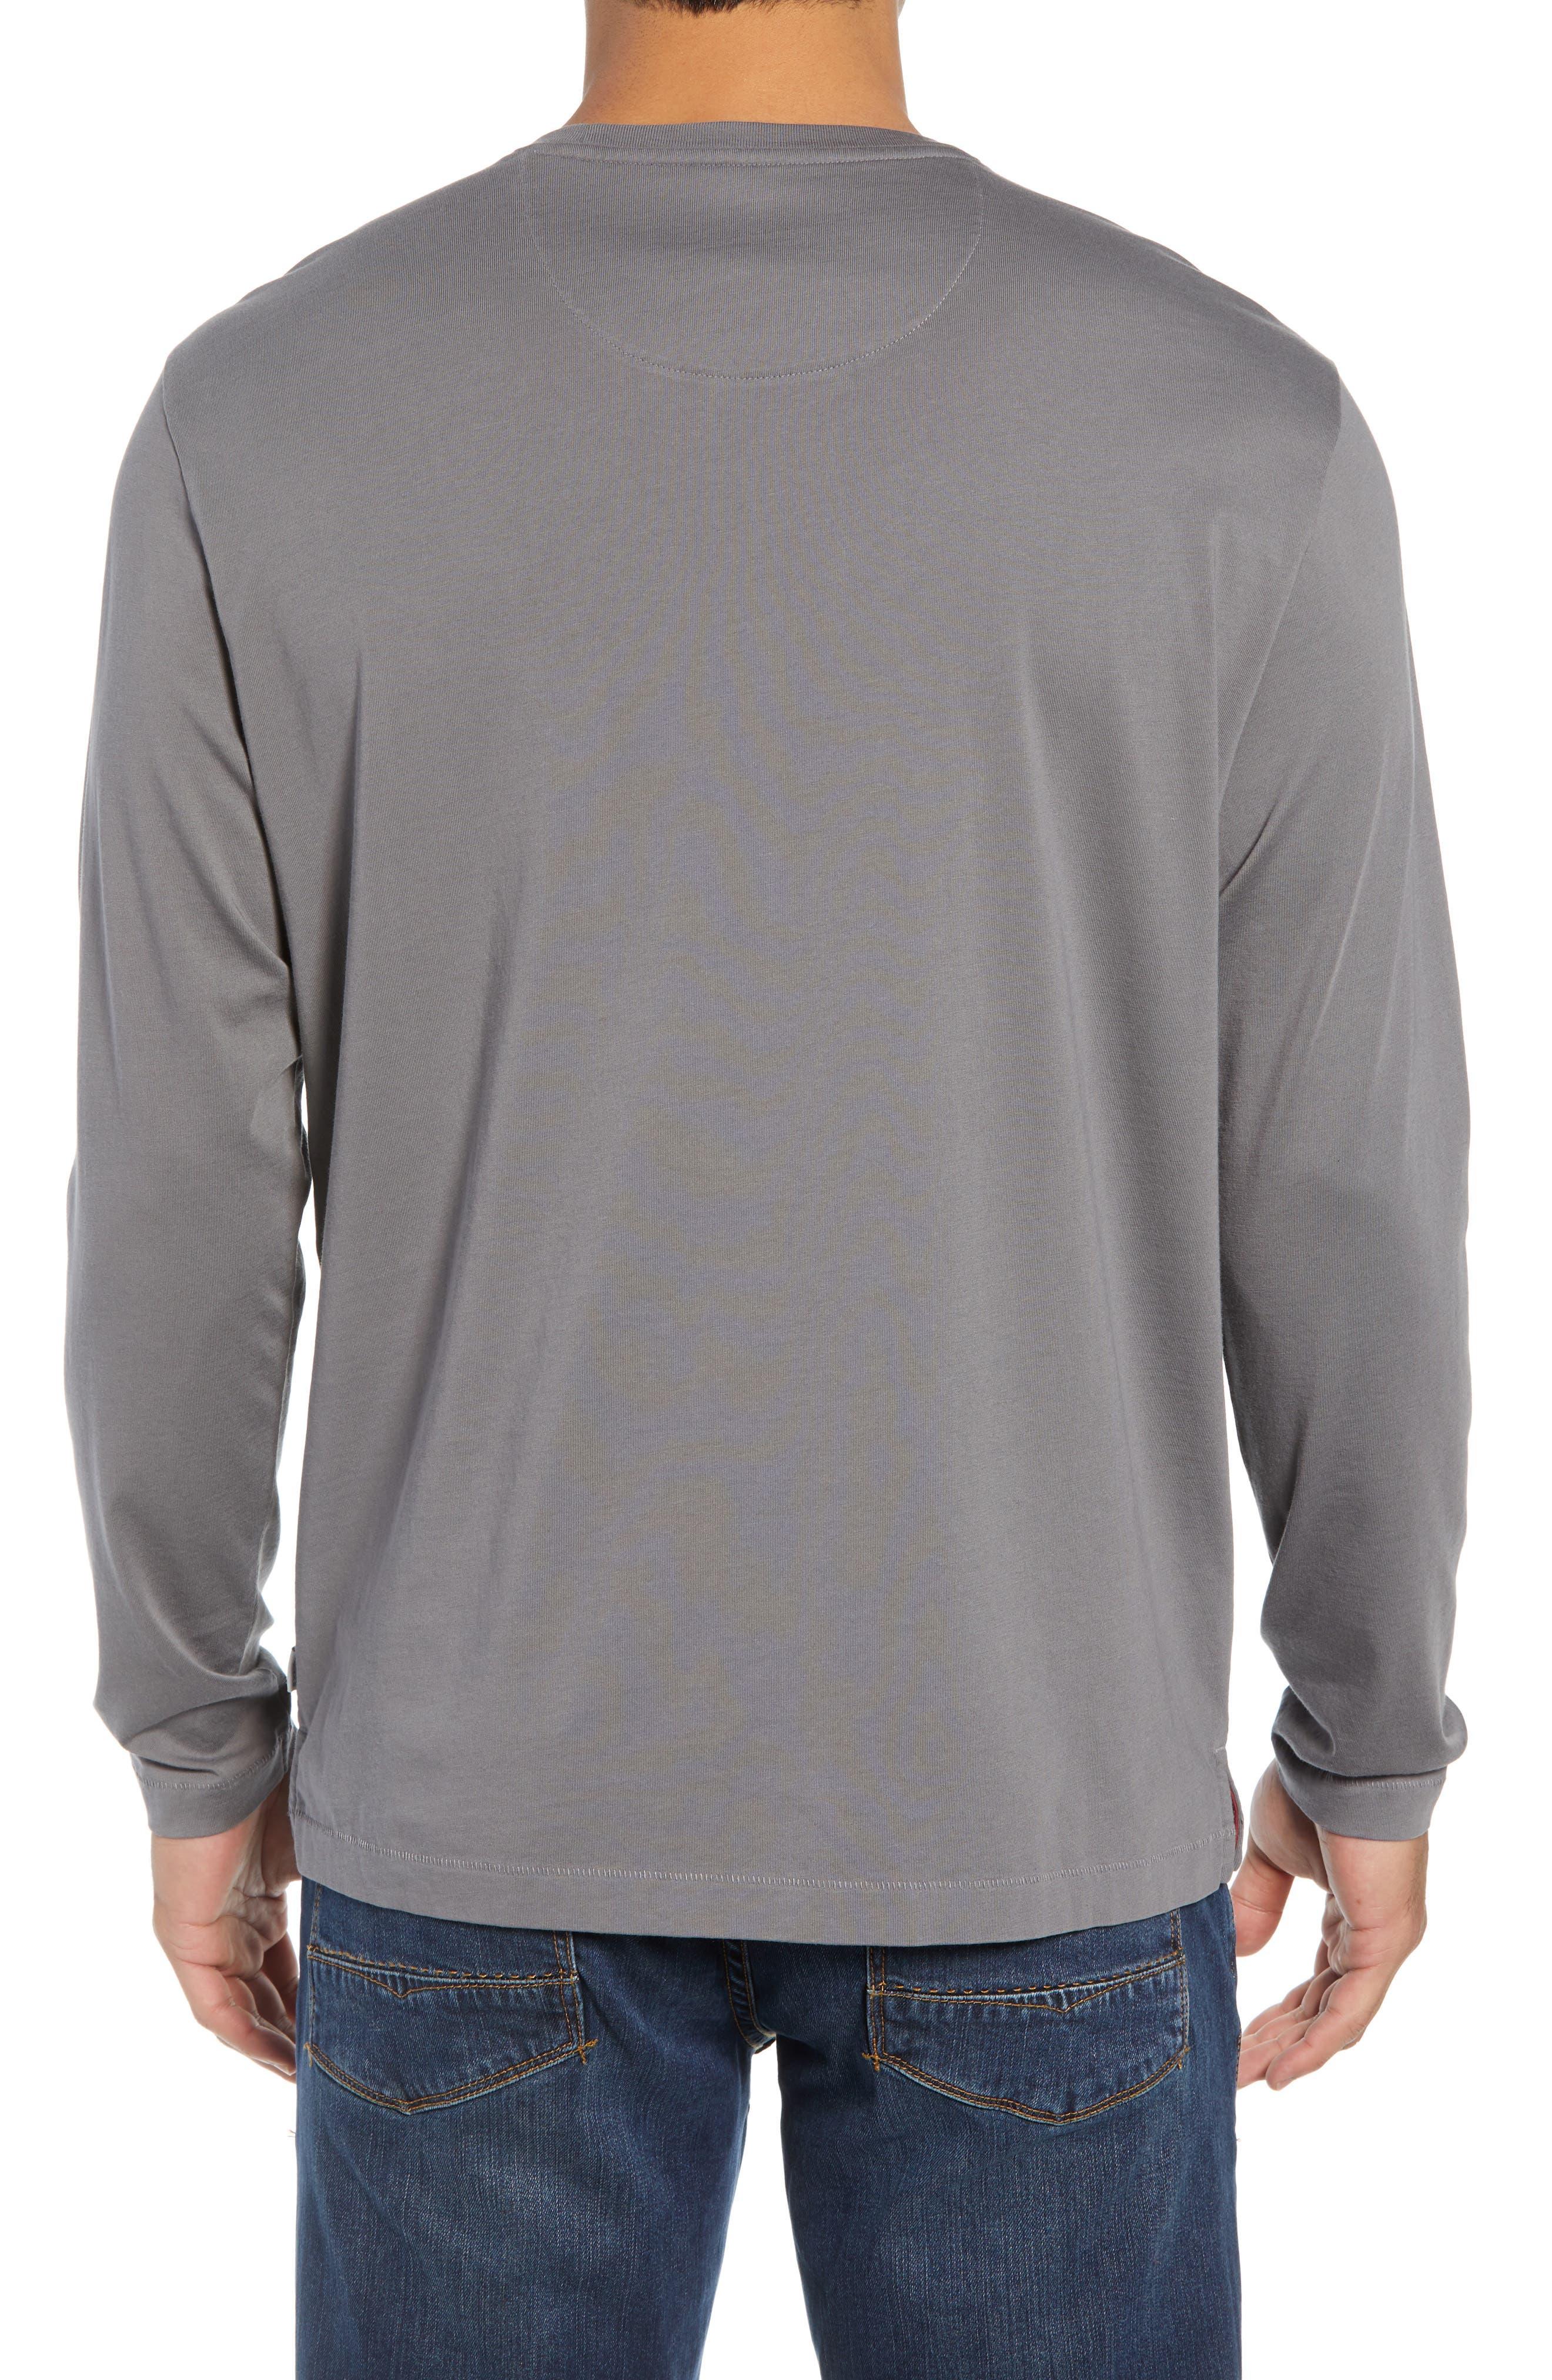 New Bali Skyline T-Shirt,                             Alternate thumbnail 2, color,                             CAVE